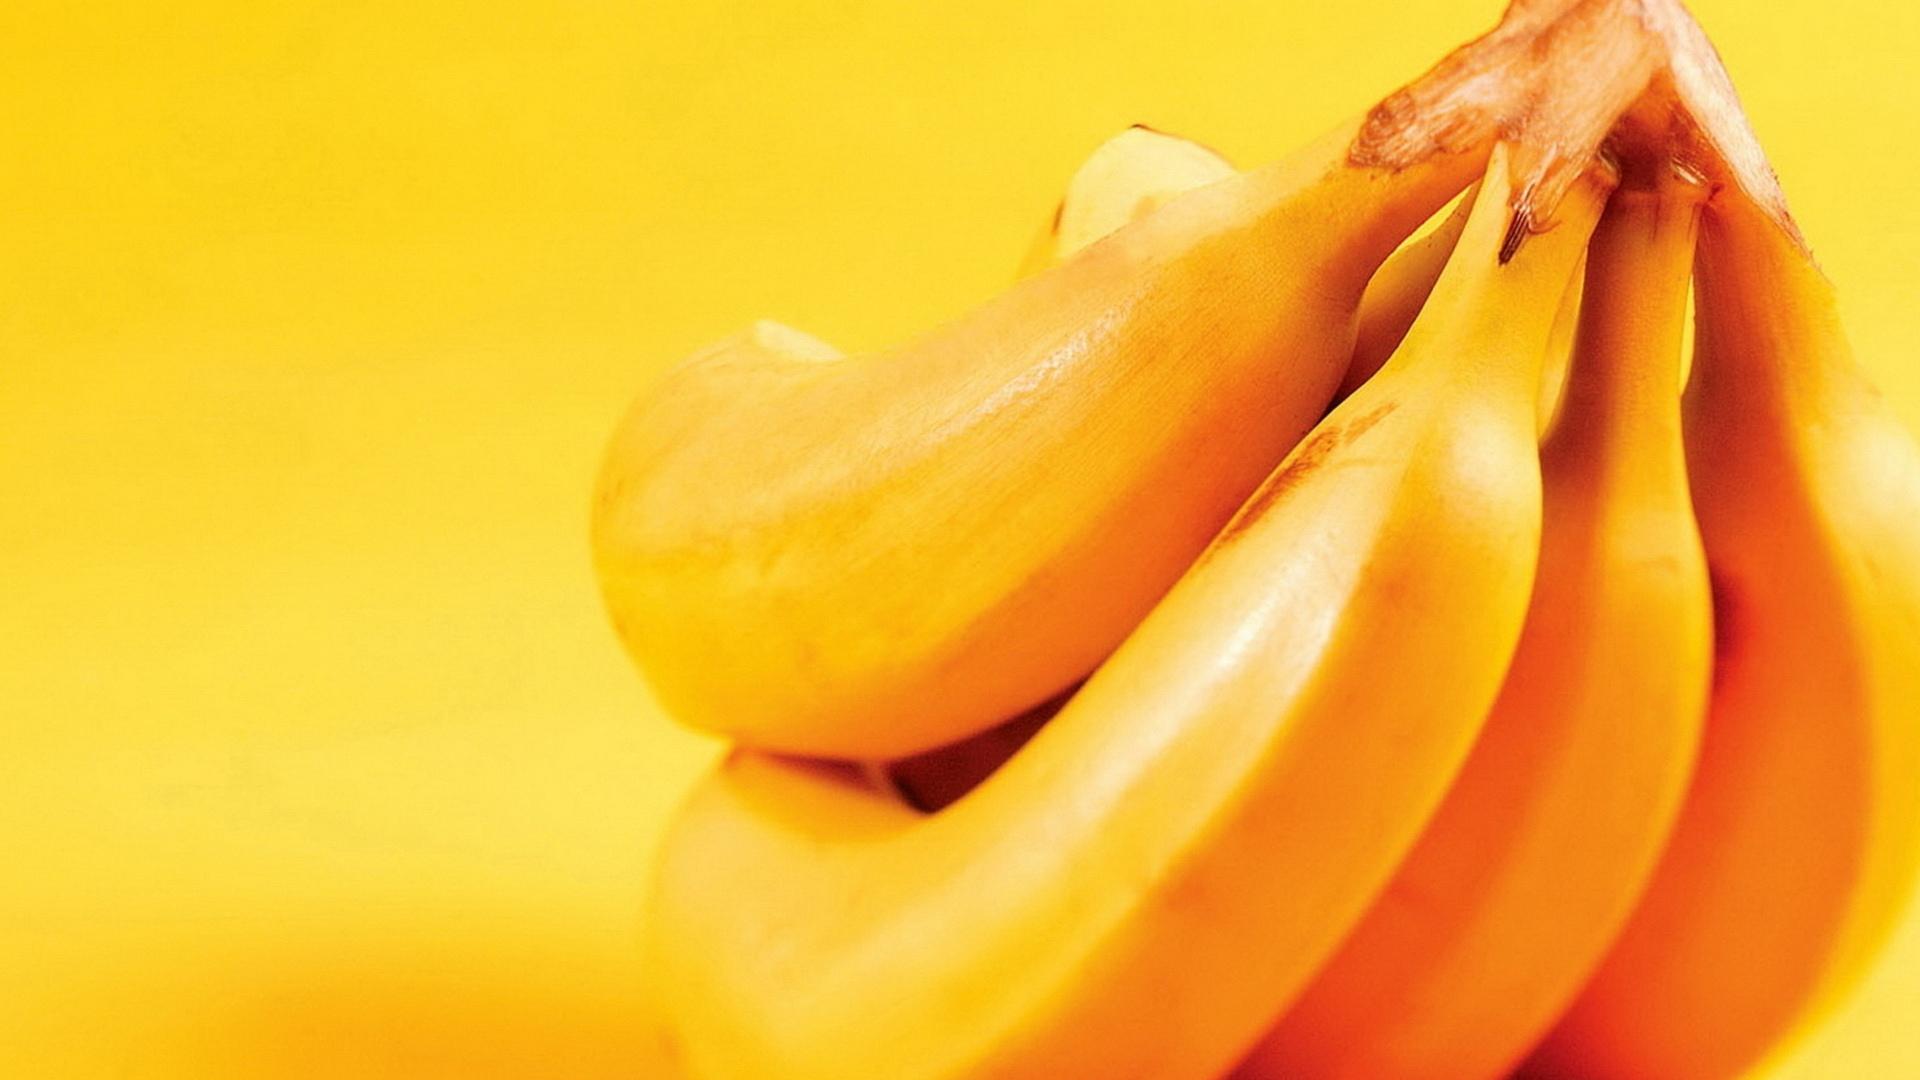 Yellow Banana Fruits Macro Wallpaper Yellow Background Wallpaper